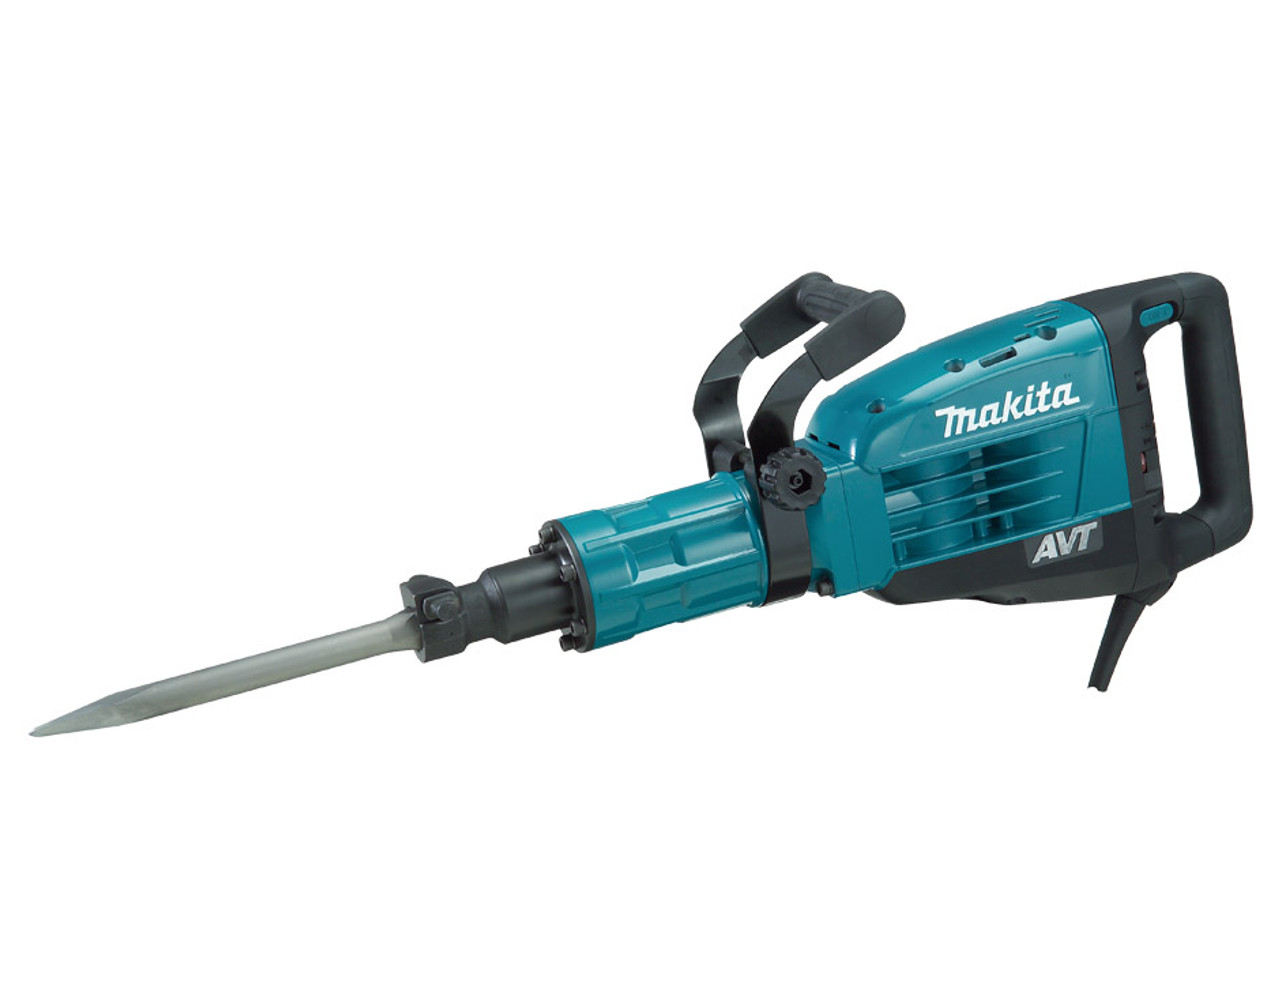 Makita Demolition Breaker Hammer 17kg 1510W AVT HM1317C